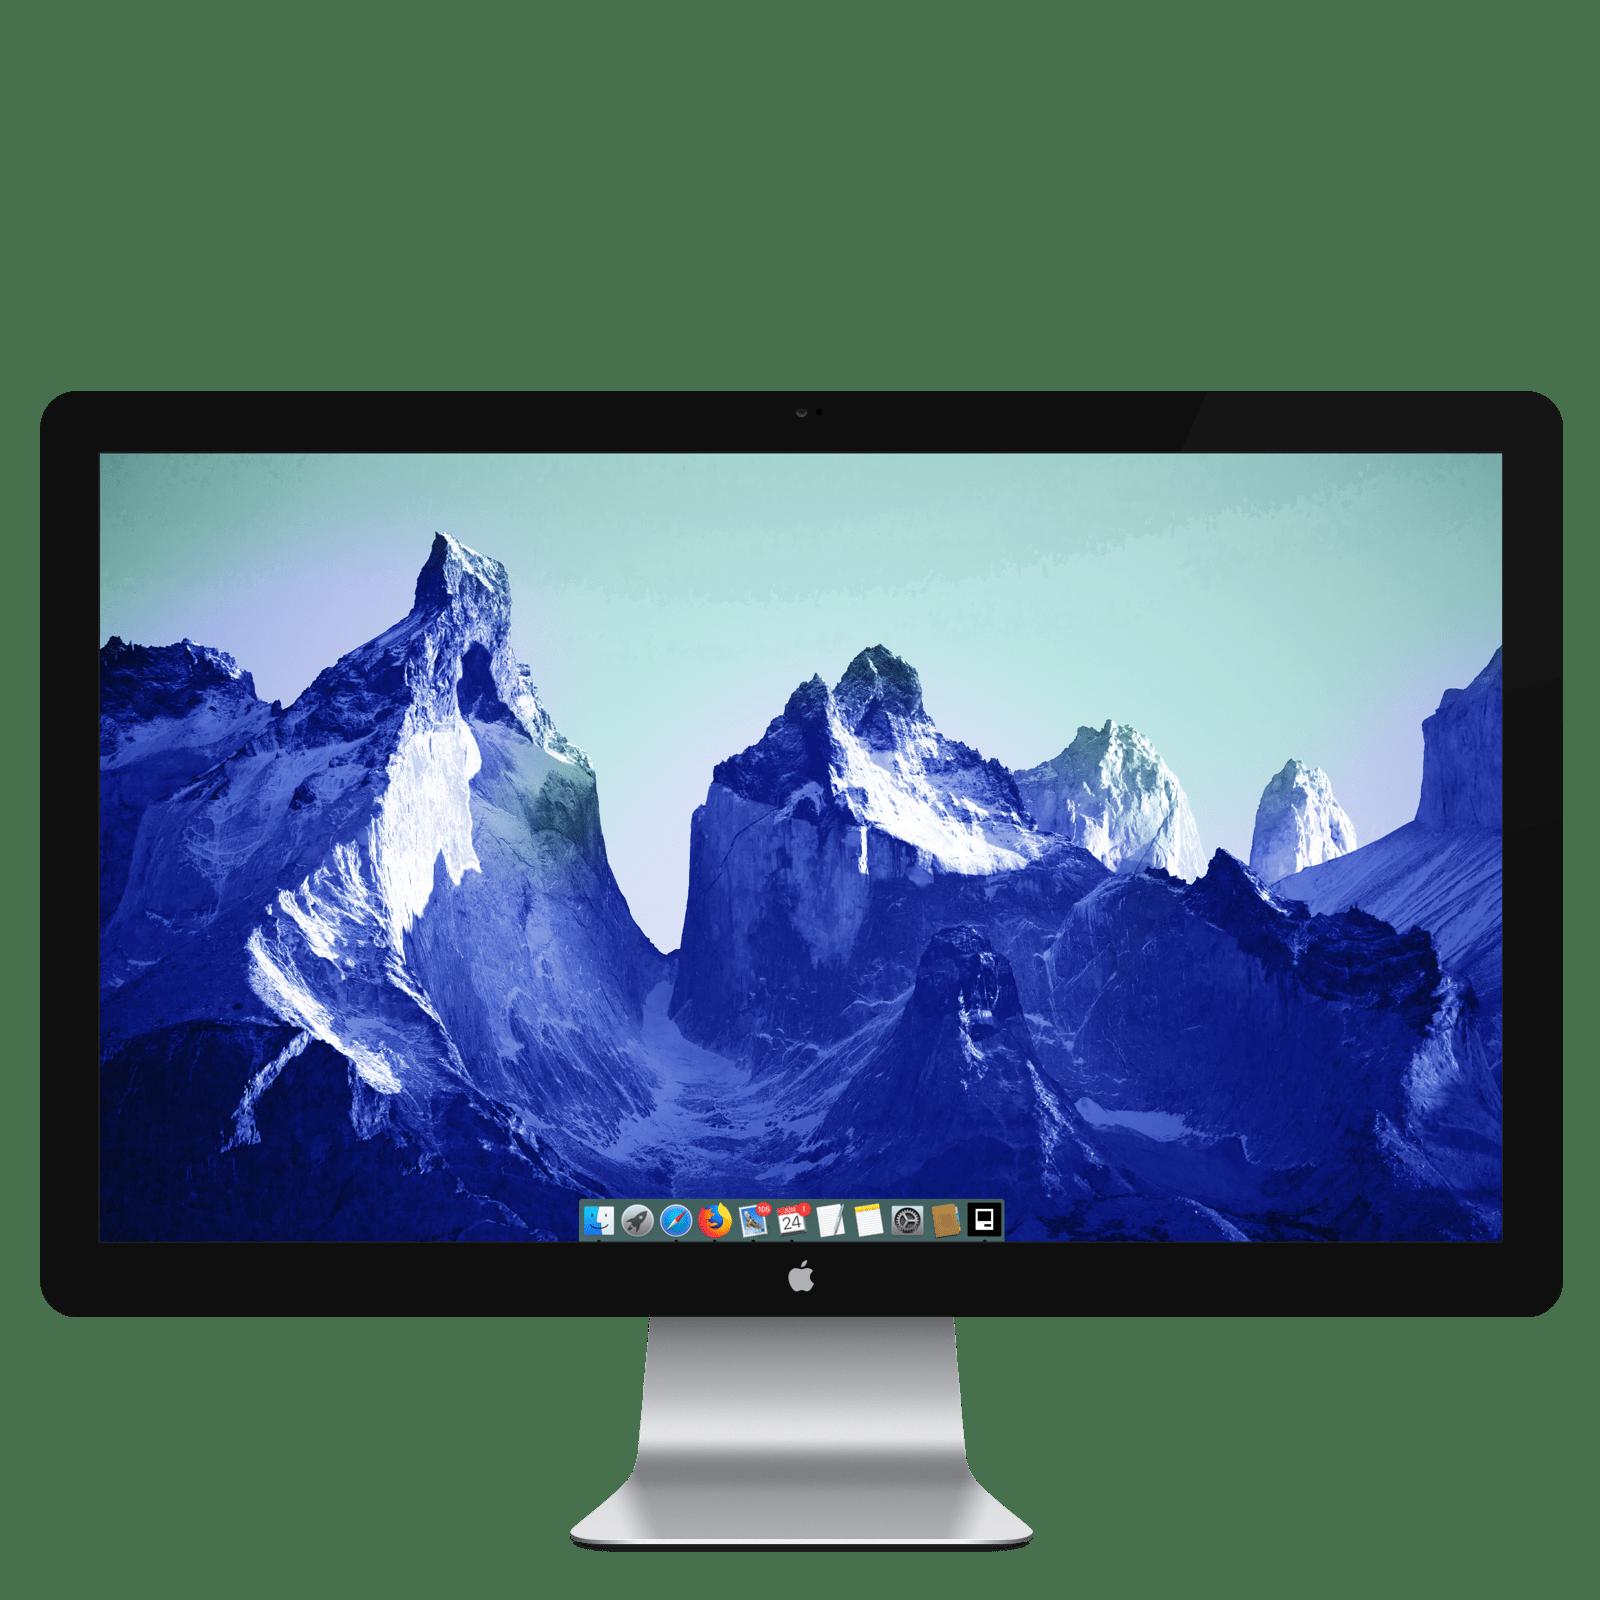 Apple Thunderbolt Display 27' Monitor